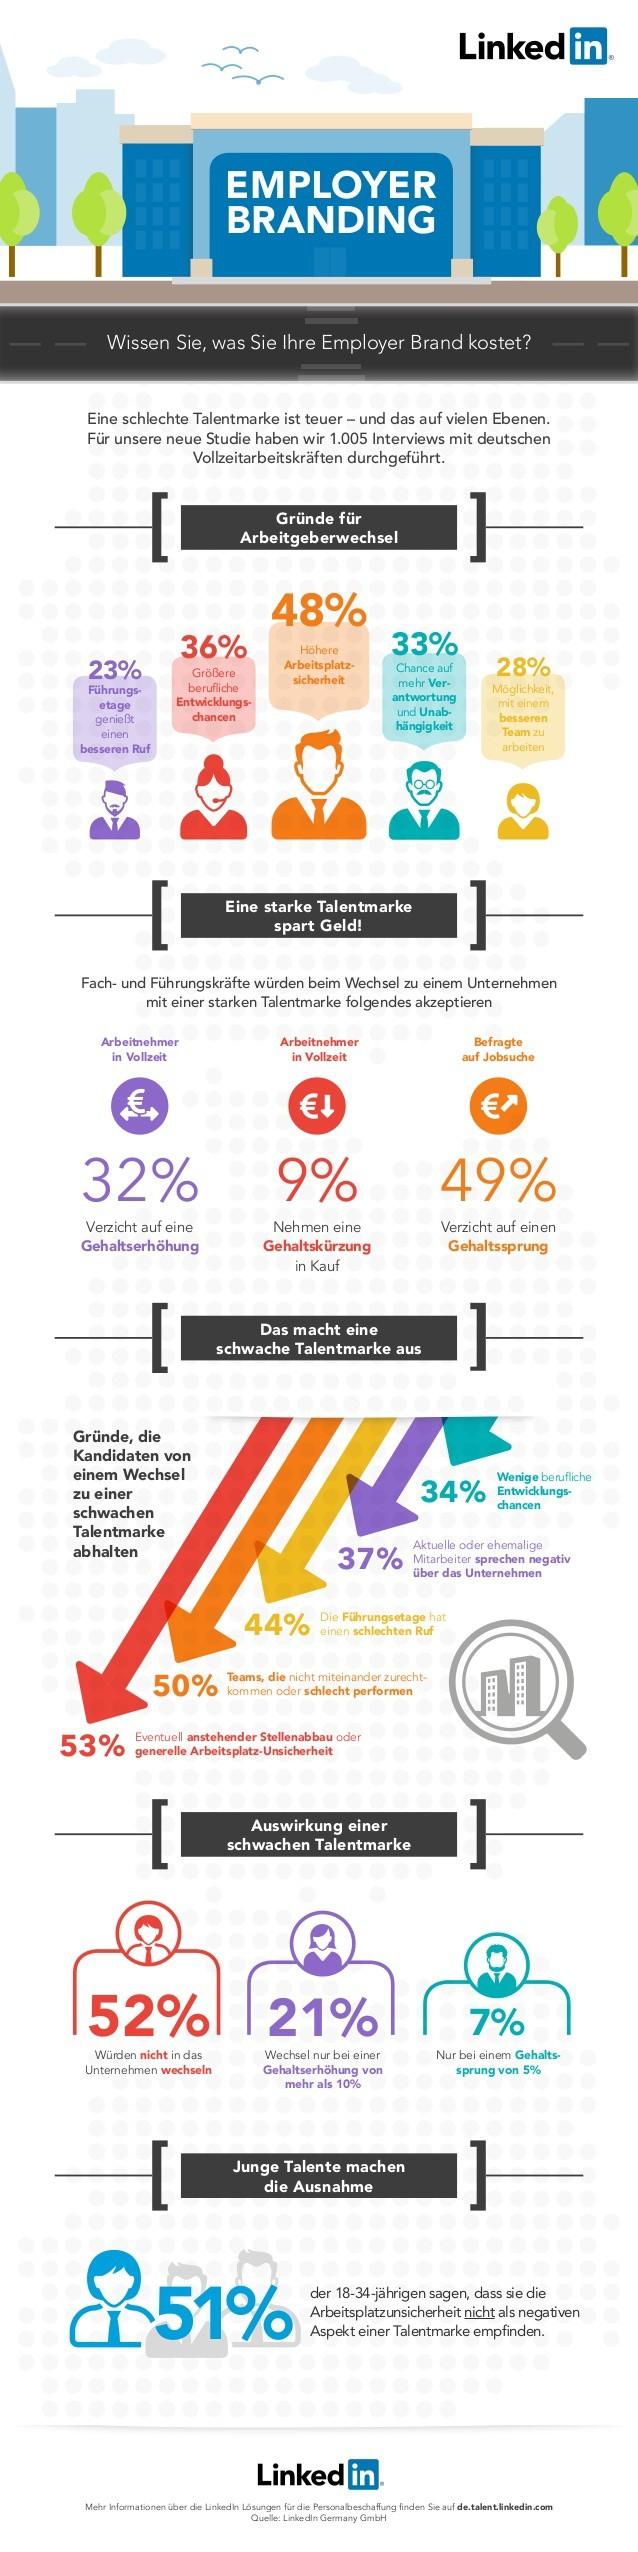 Linkedin Infografik zum Thema Arbeitgebermarke.